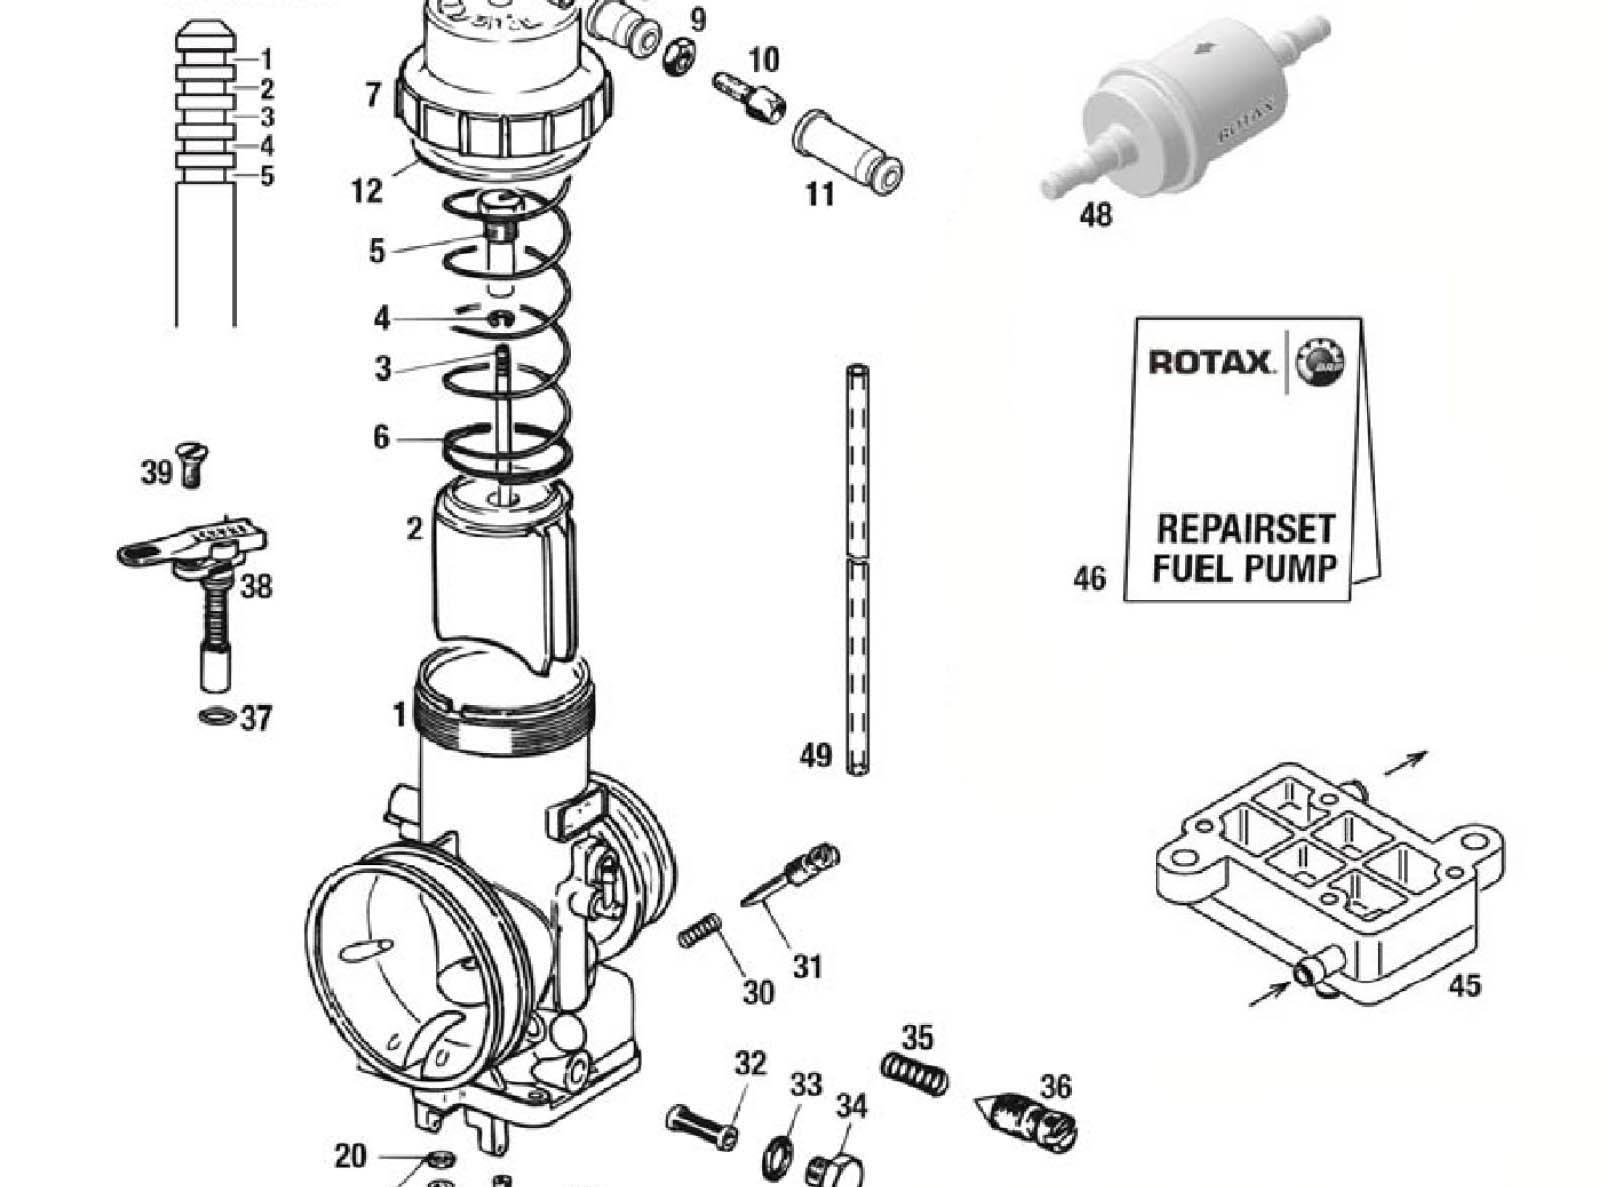 Carburetor Psl Karting Store Rotax Engine Diagram